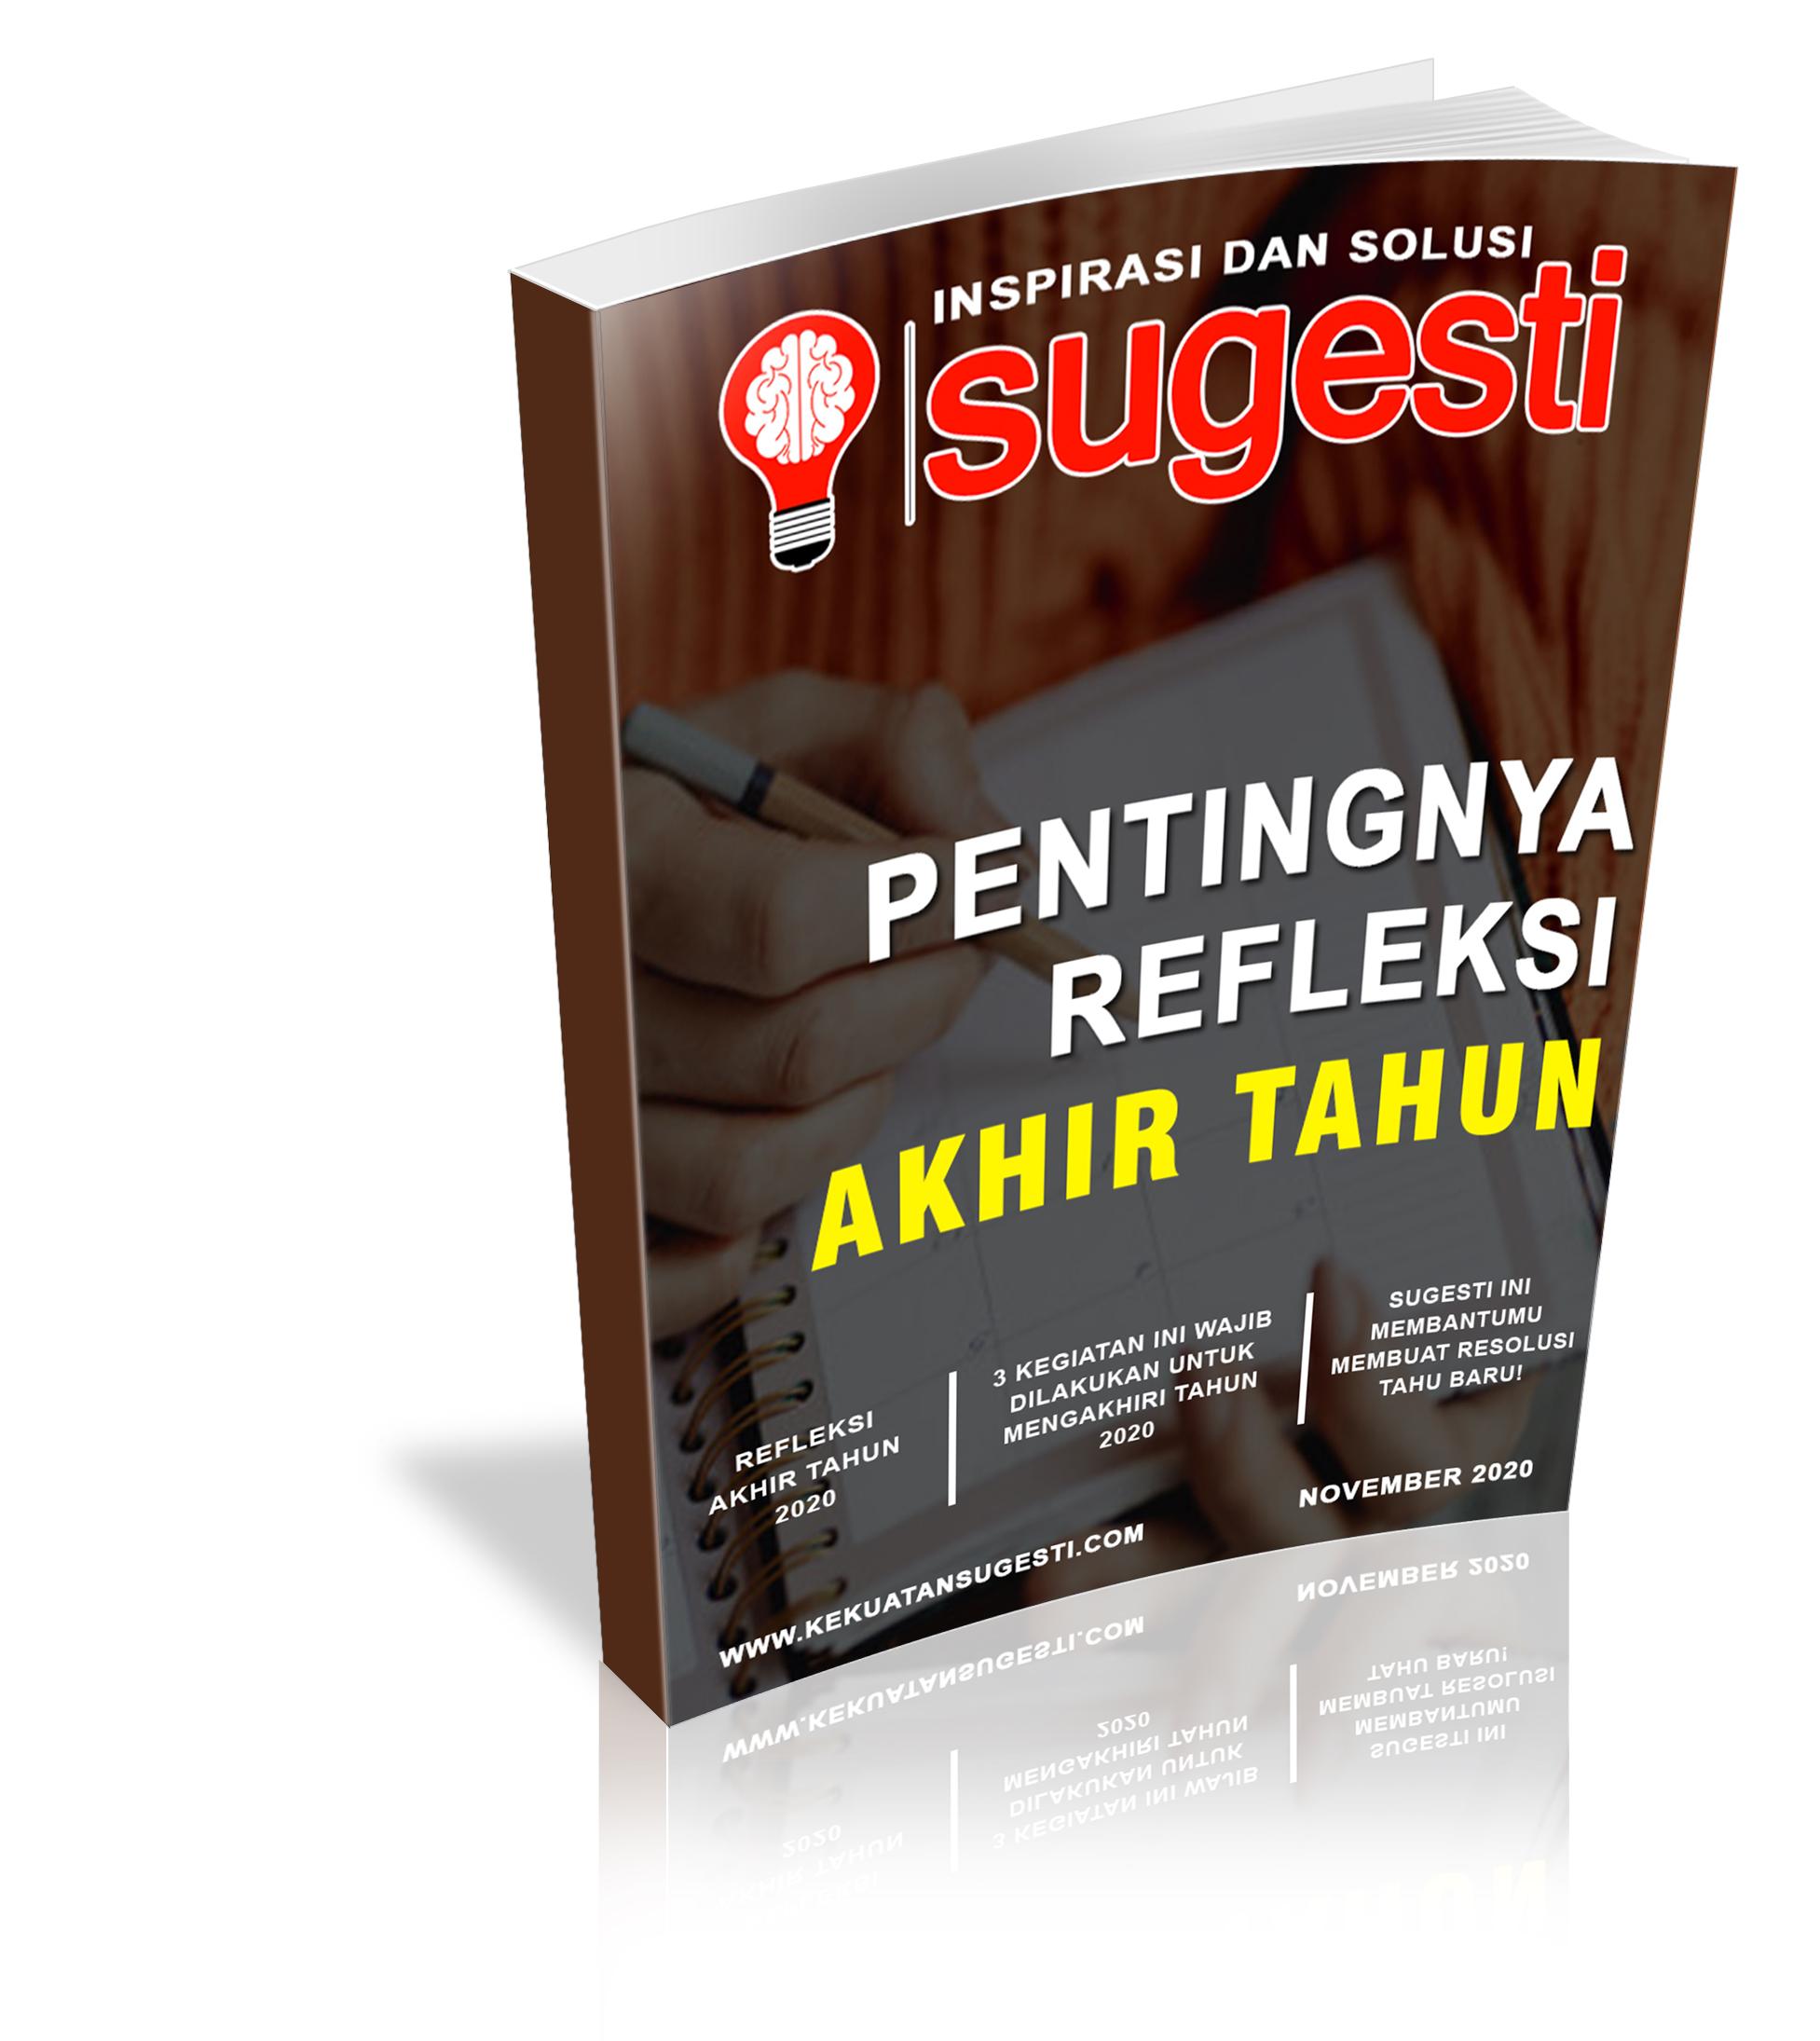 Majalah Sugesti Edisi Ke TujuhPuluh Tujuh Bulan Nopember 2020